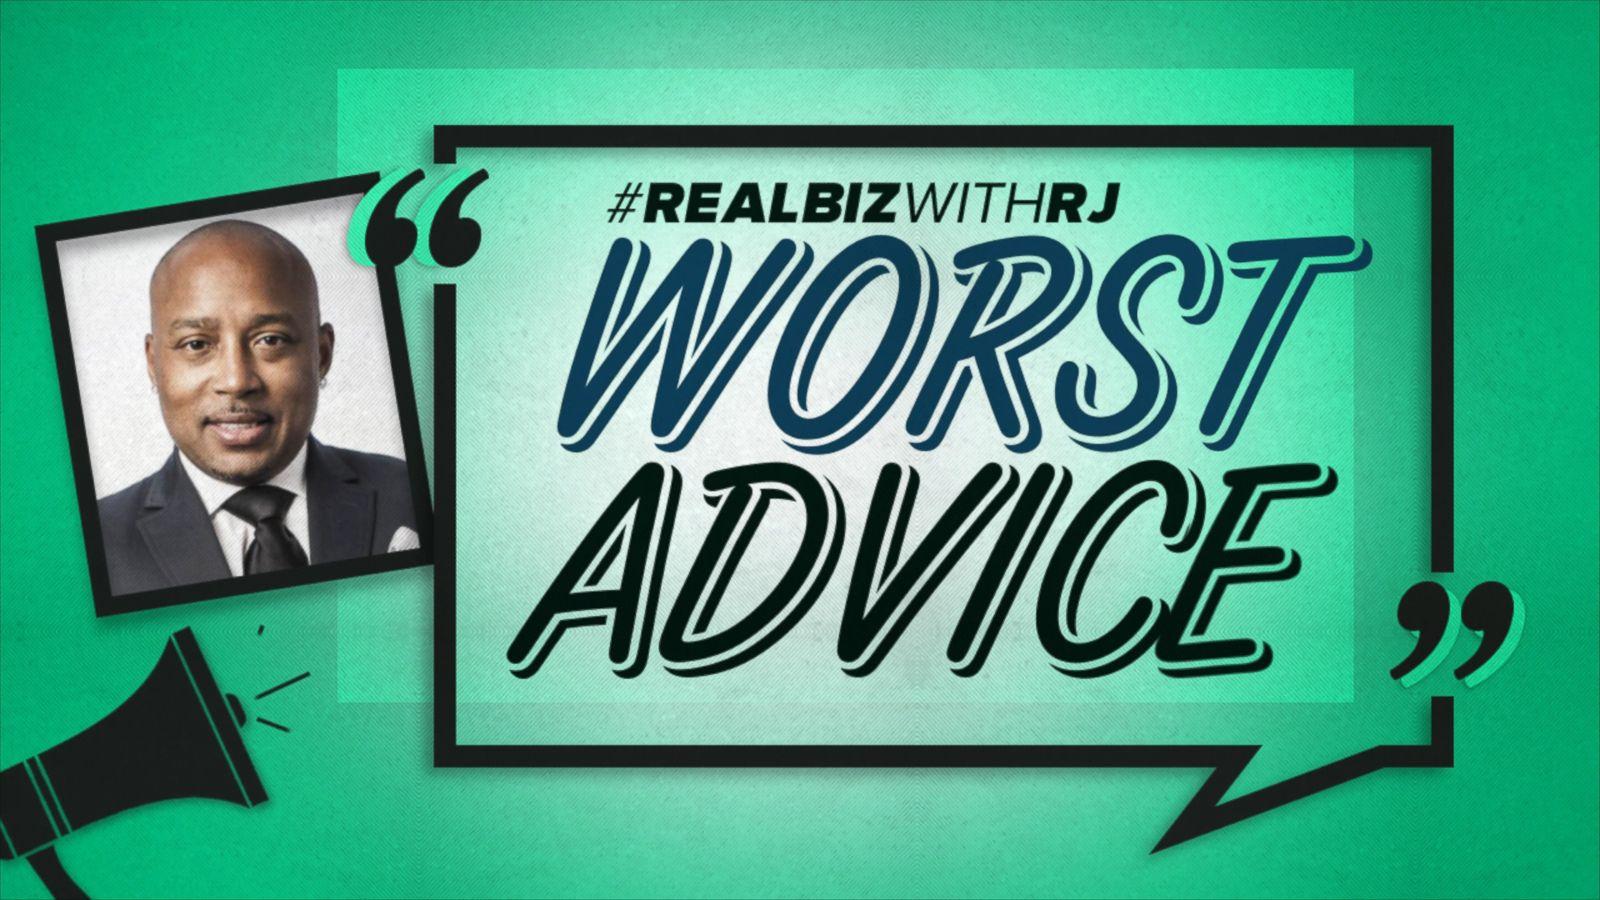 Worst Advice: Daymond John